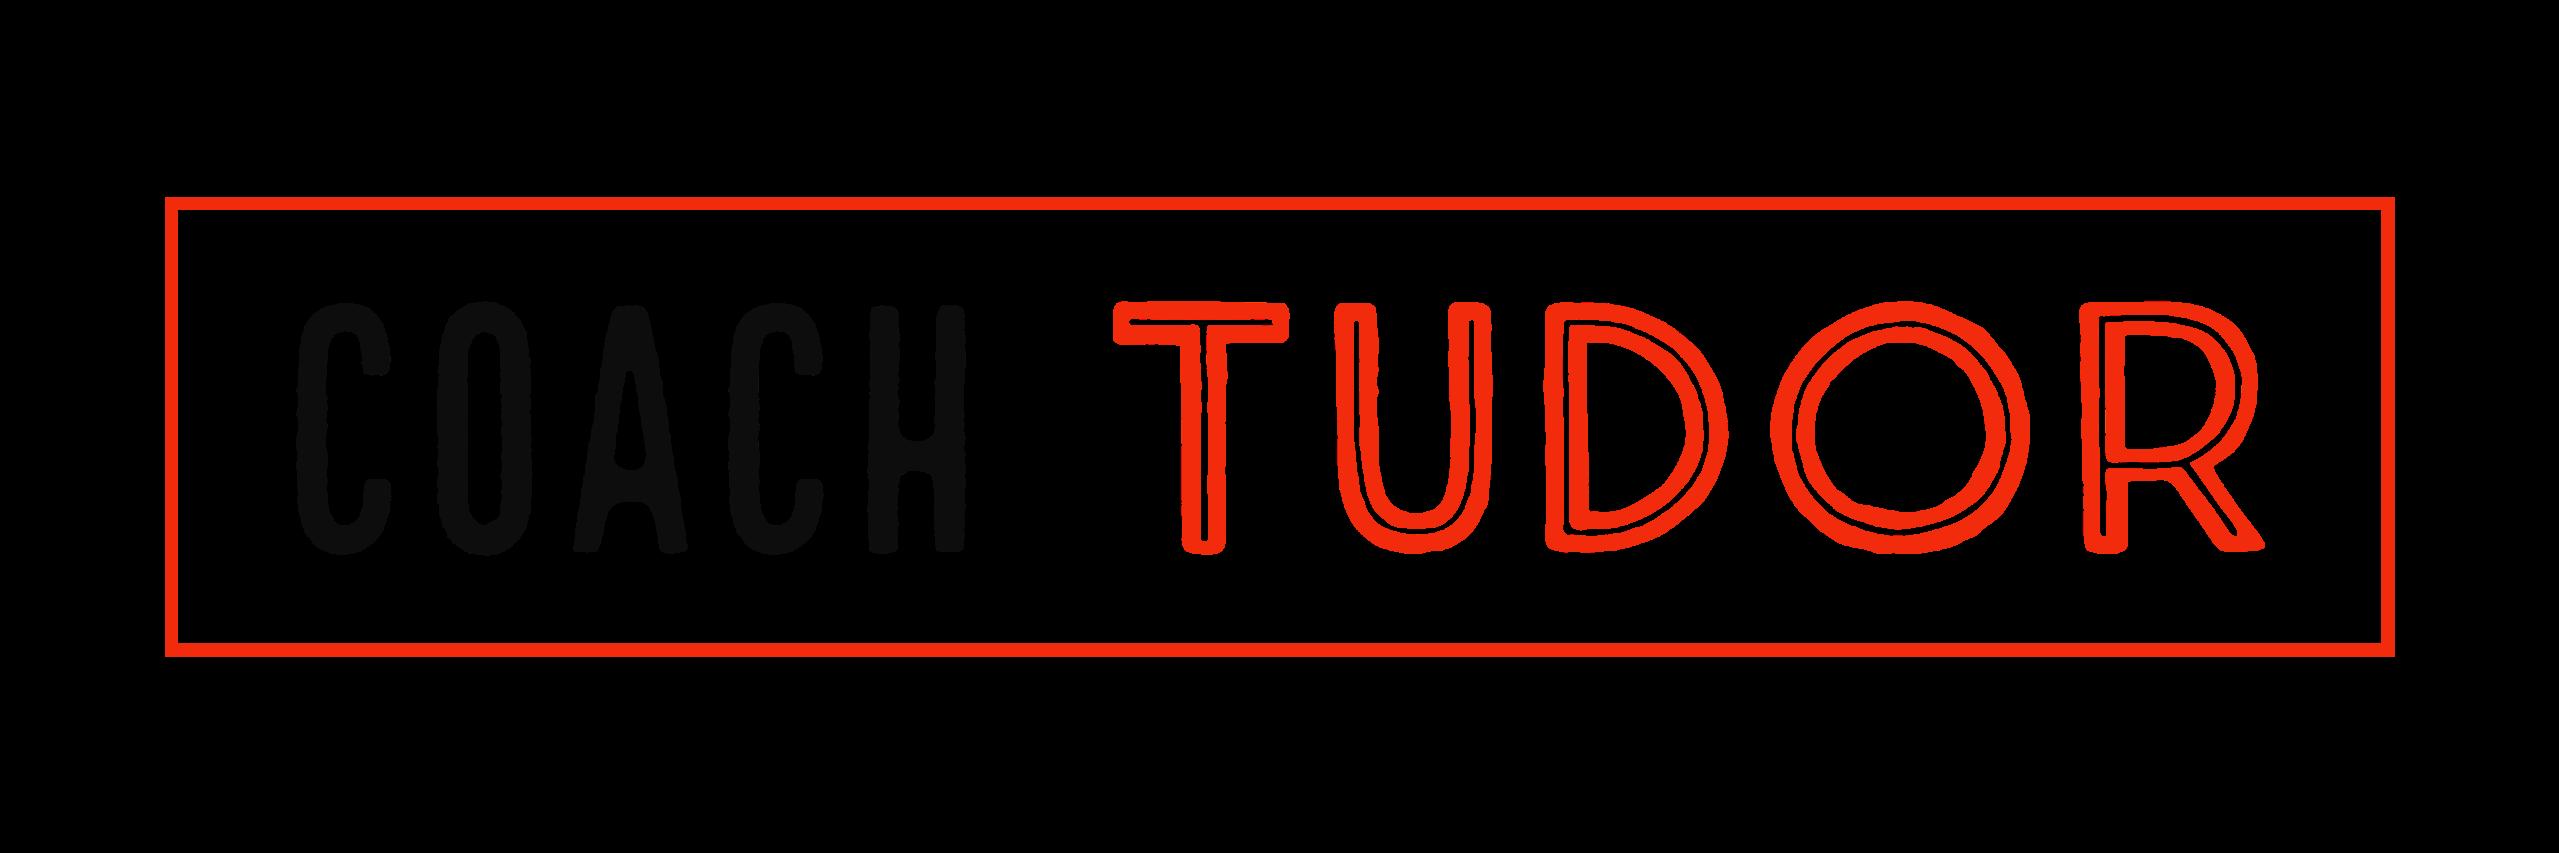 Coach Tudor